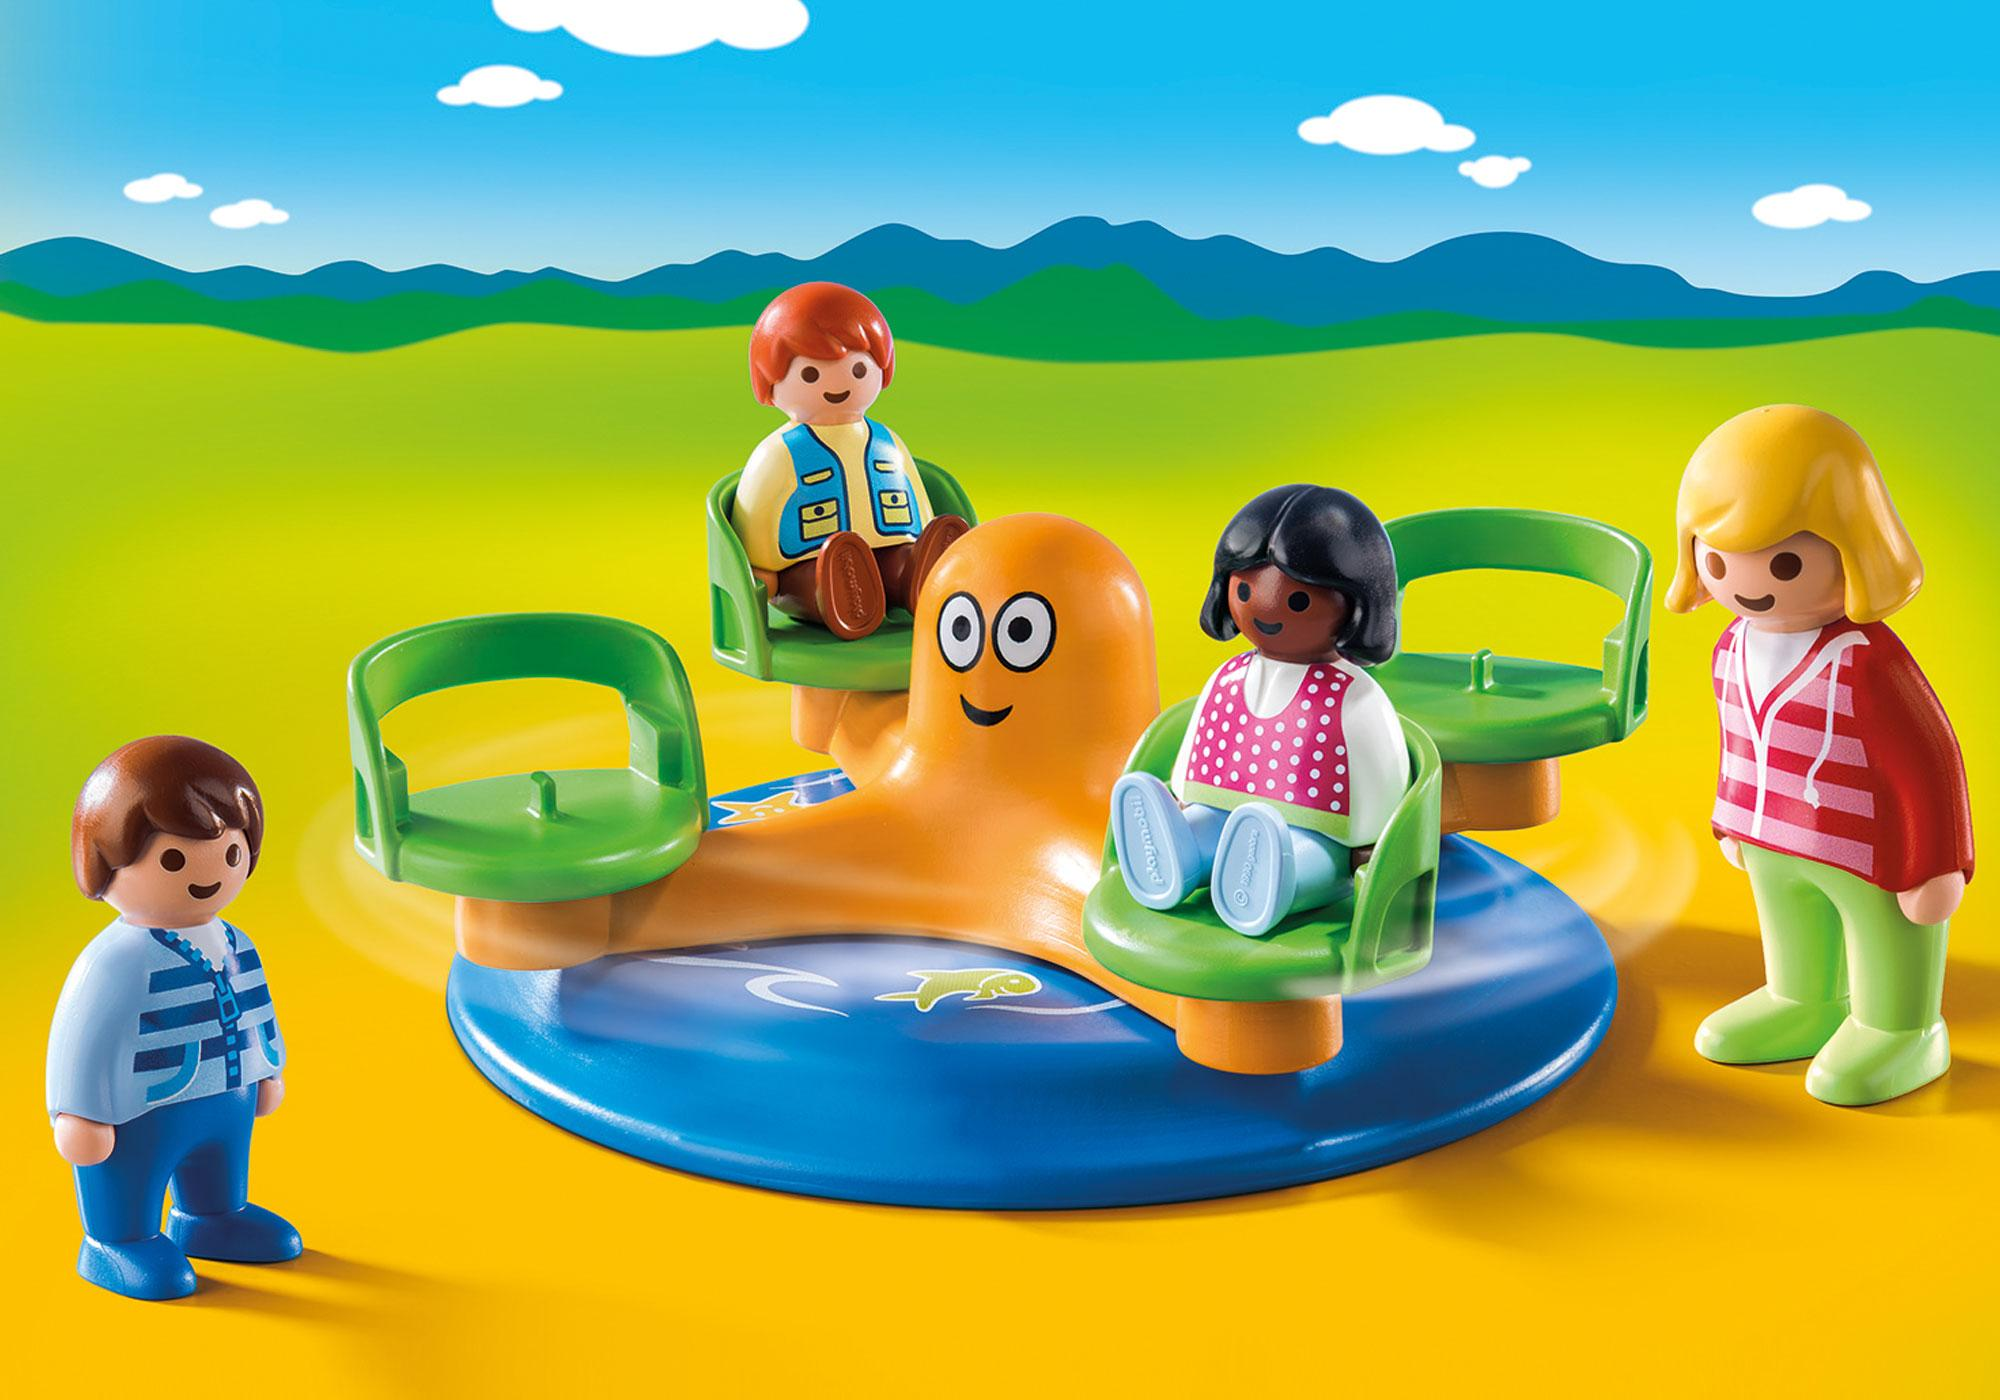 http://media.playmobil.com/i/playmobil/9379_product_detail/1.2.3 Carrossel Infantil